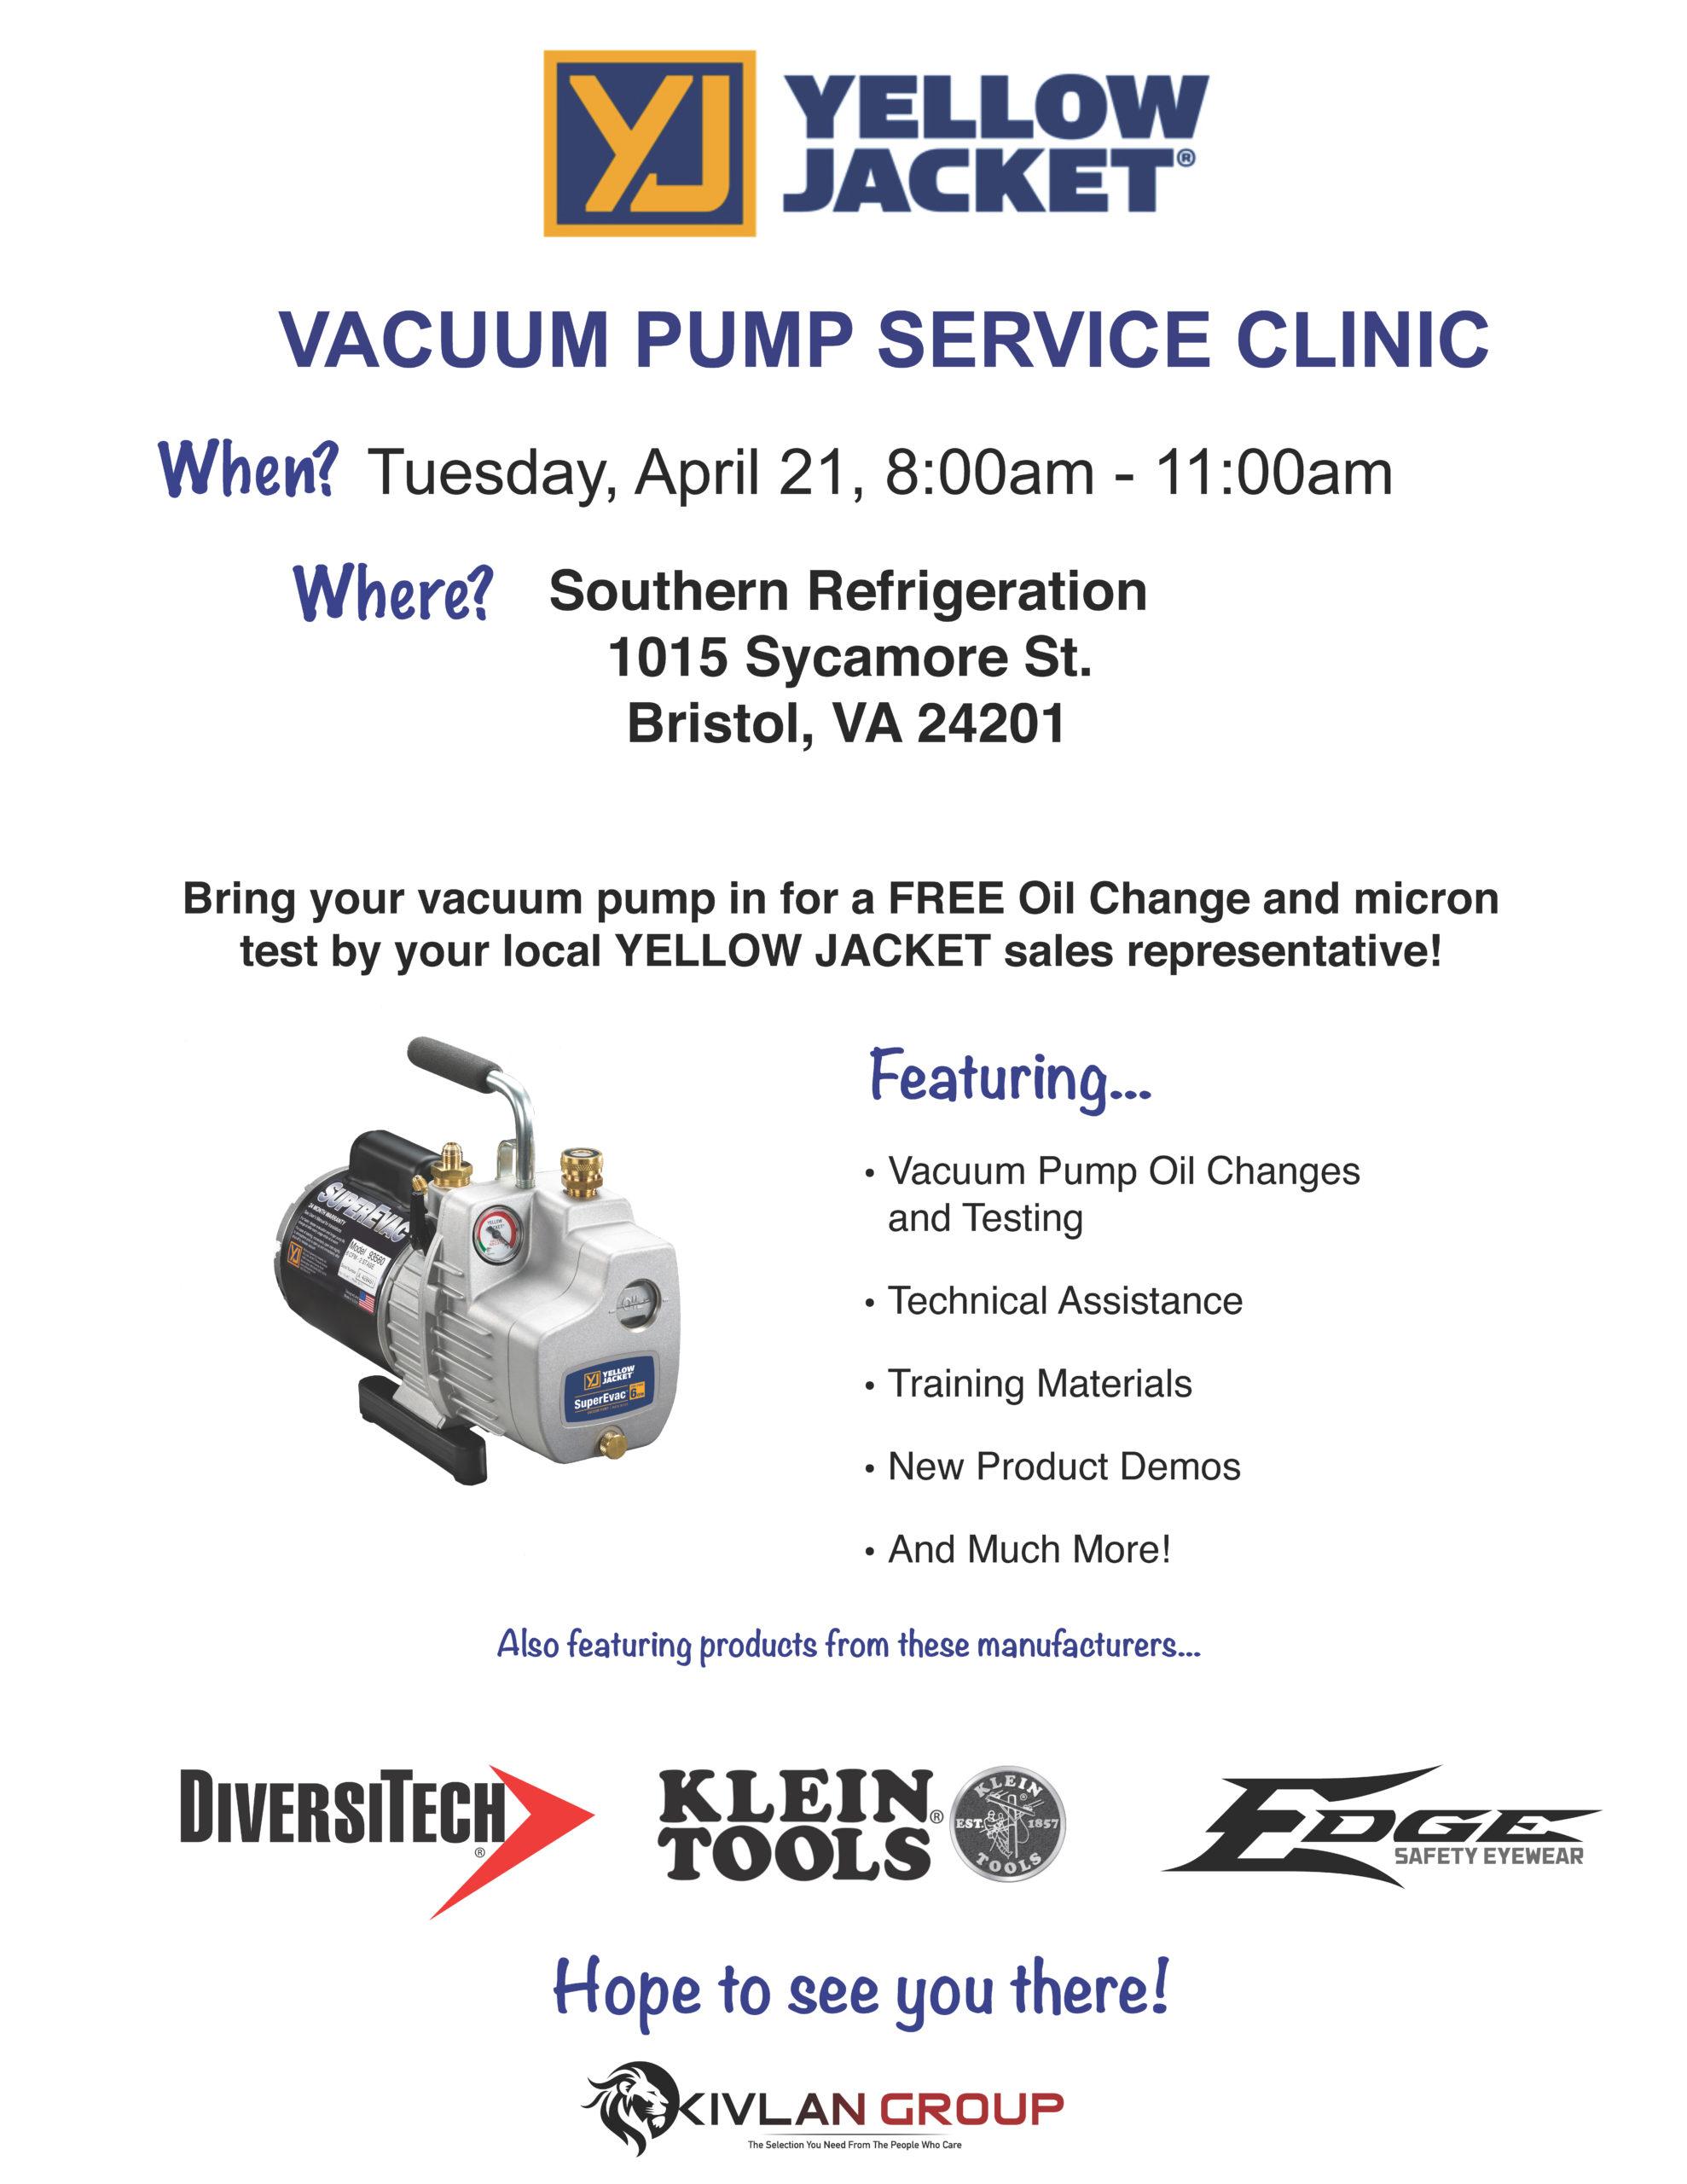 Yellow Jacket Vacuum Pump Service – Bristol @ Southern Refrigeration - Bristol